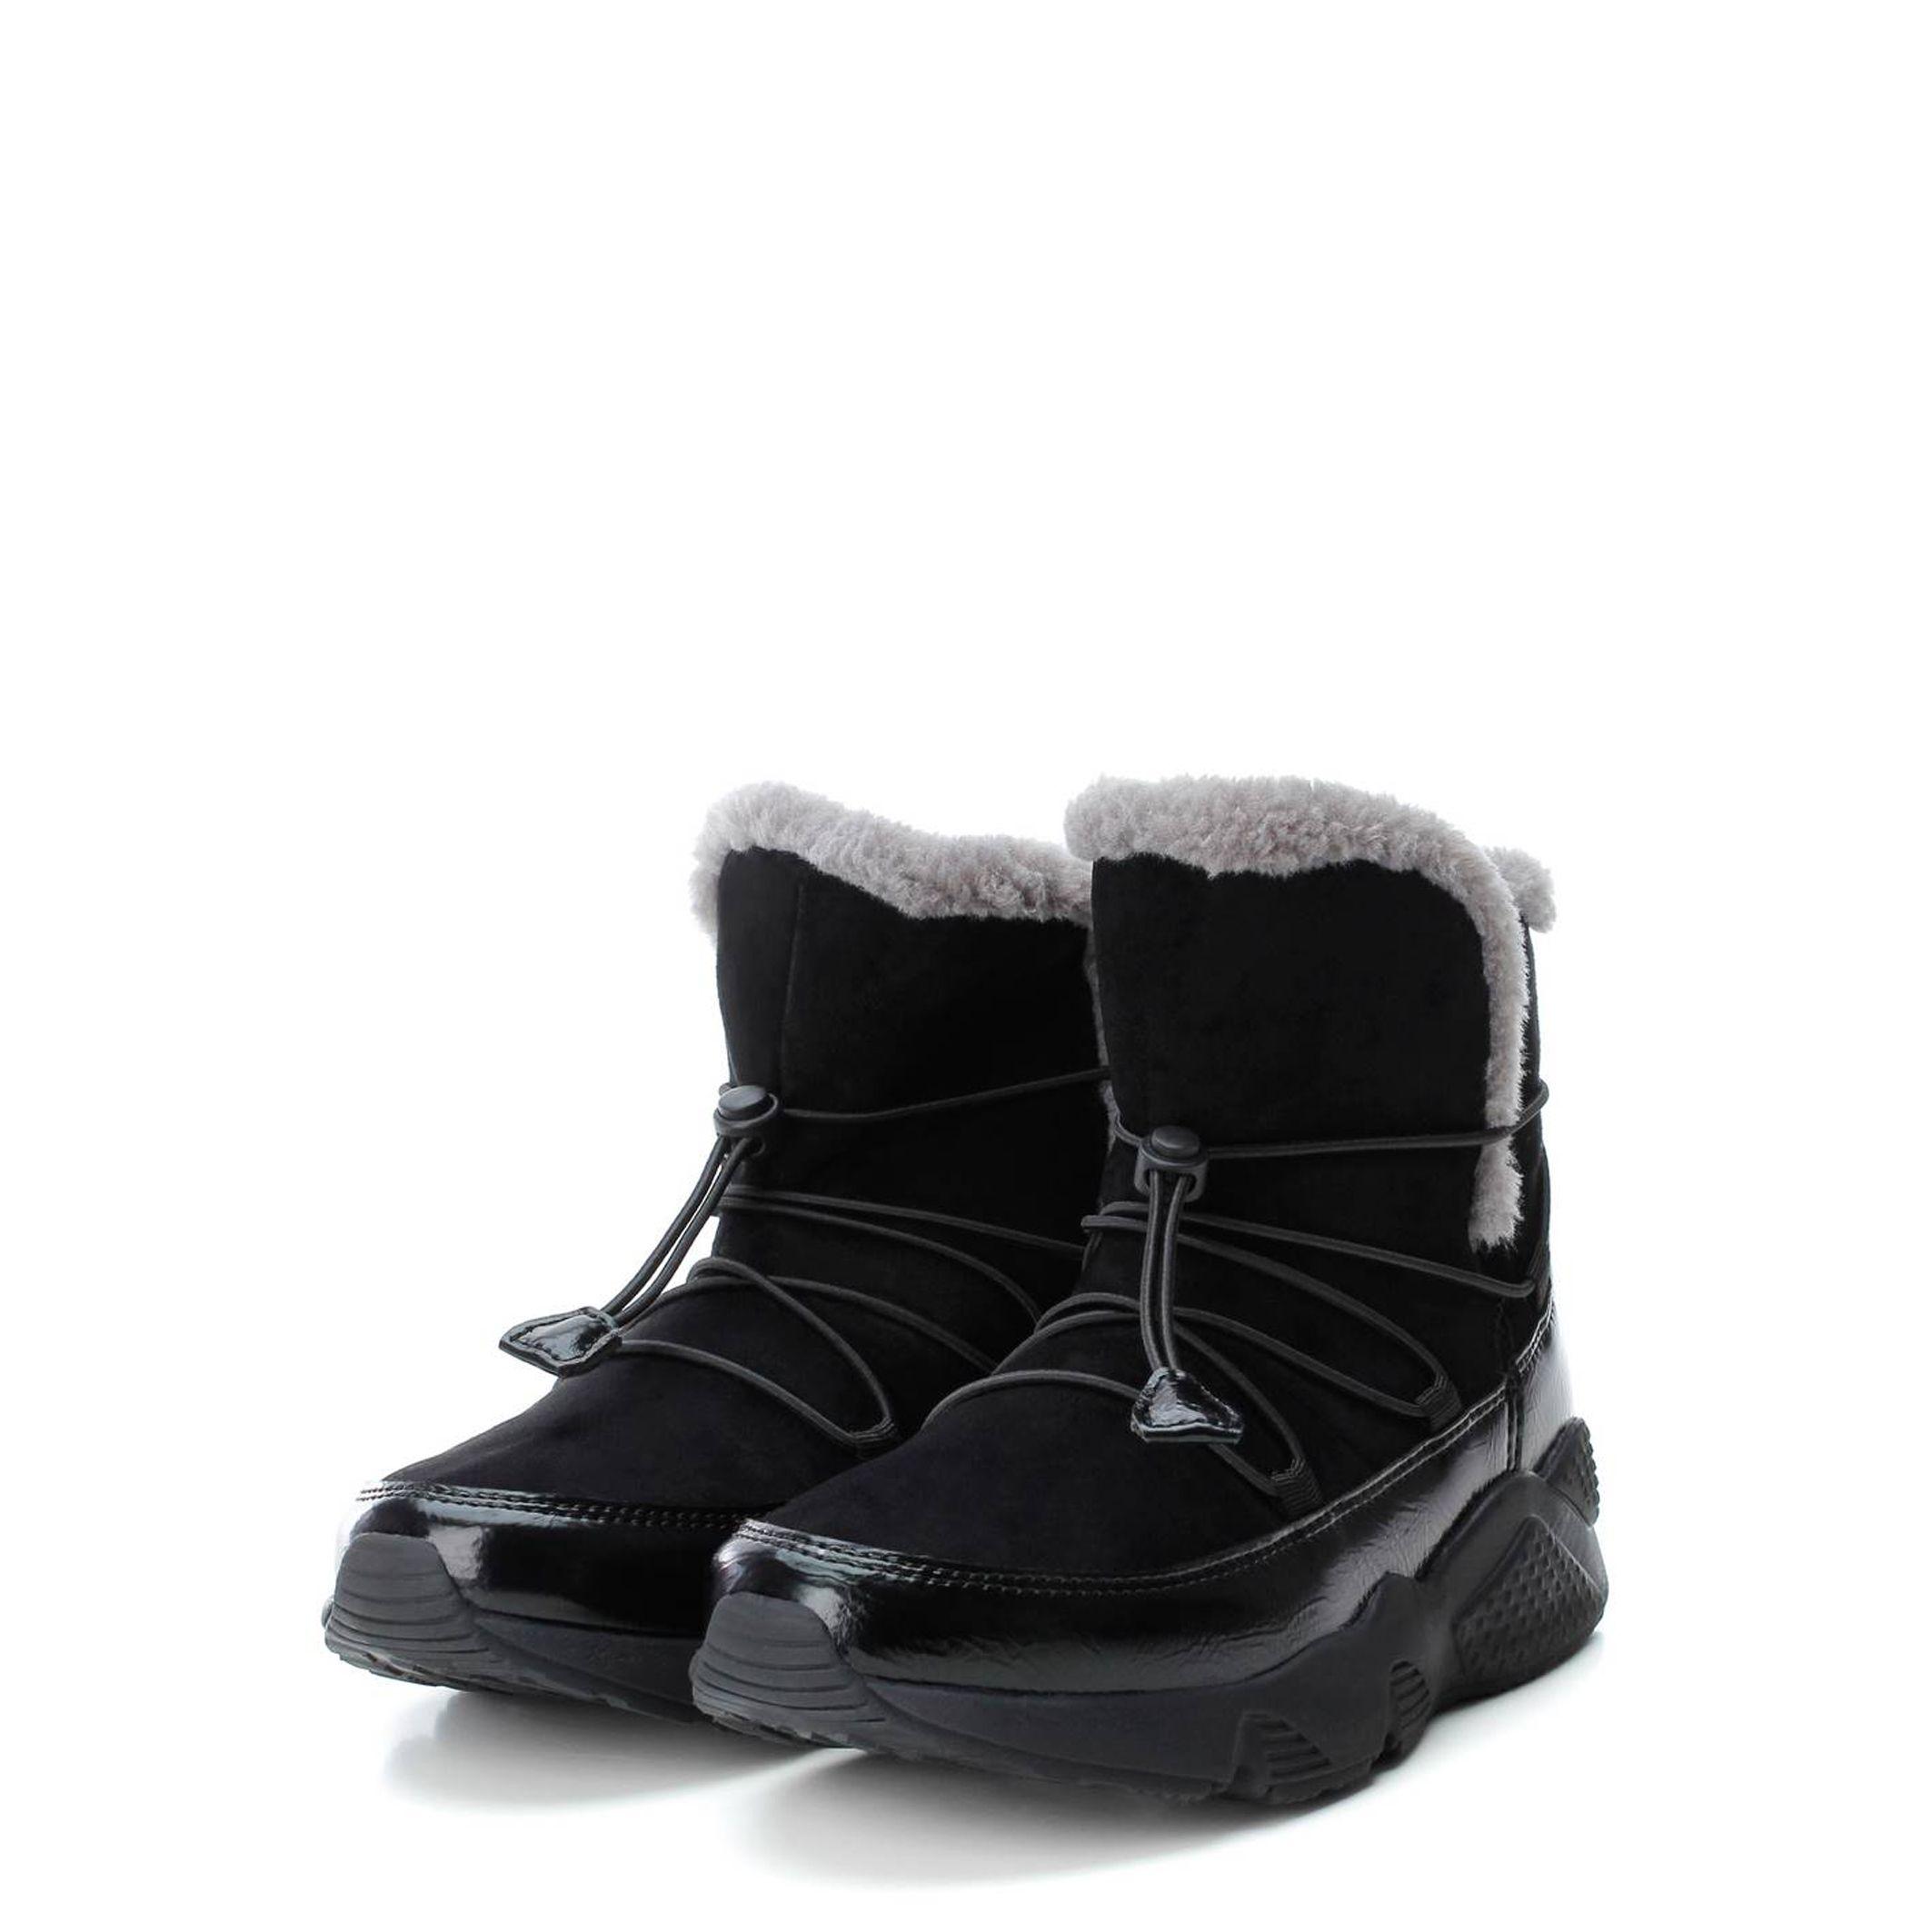 Schuhe Xti – 49514 – Schwarz